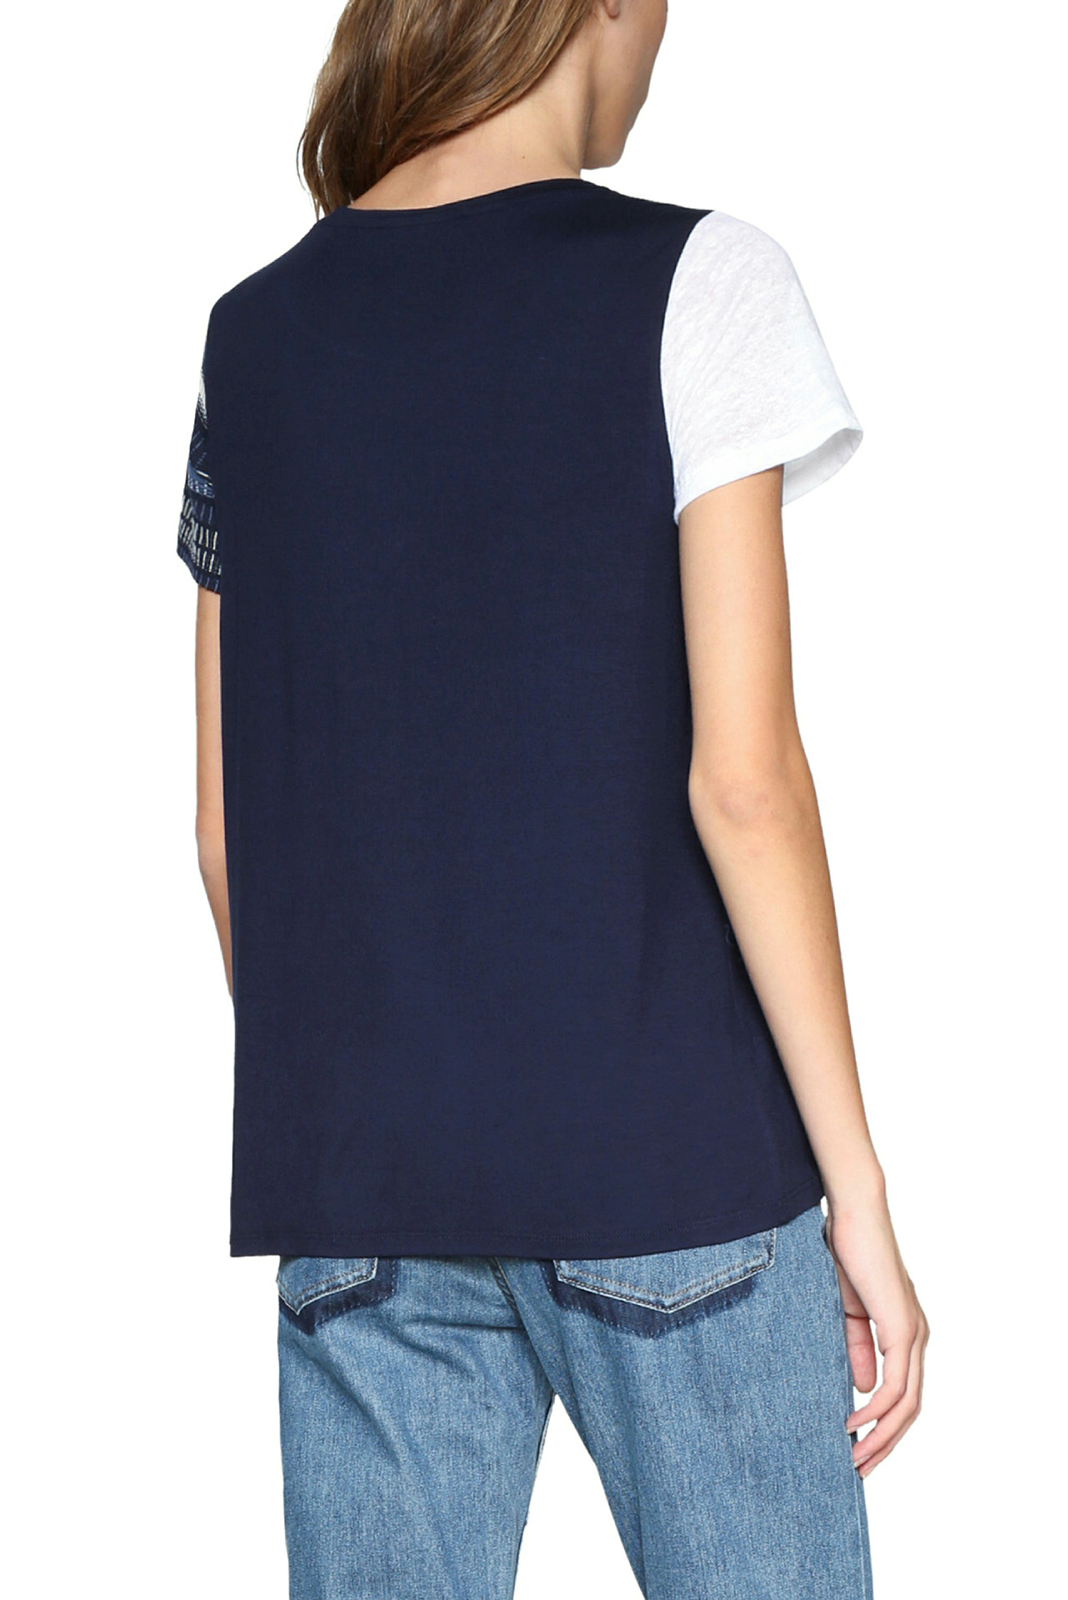 White Desigual 18 Uk 49 Blue 8 Patchwork amp; Top Rrp xxl Tshirt Bemus Xs TqqwZ1XxH